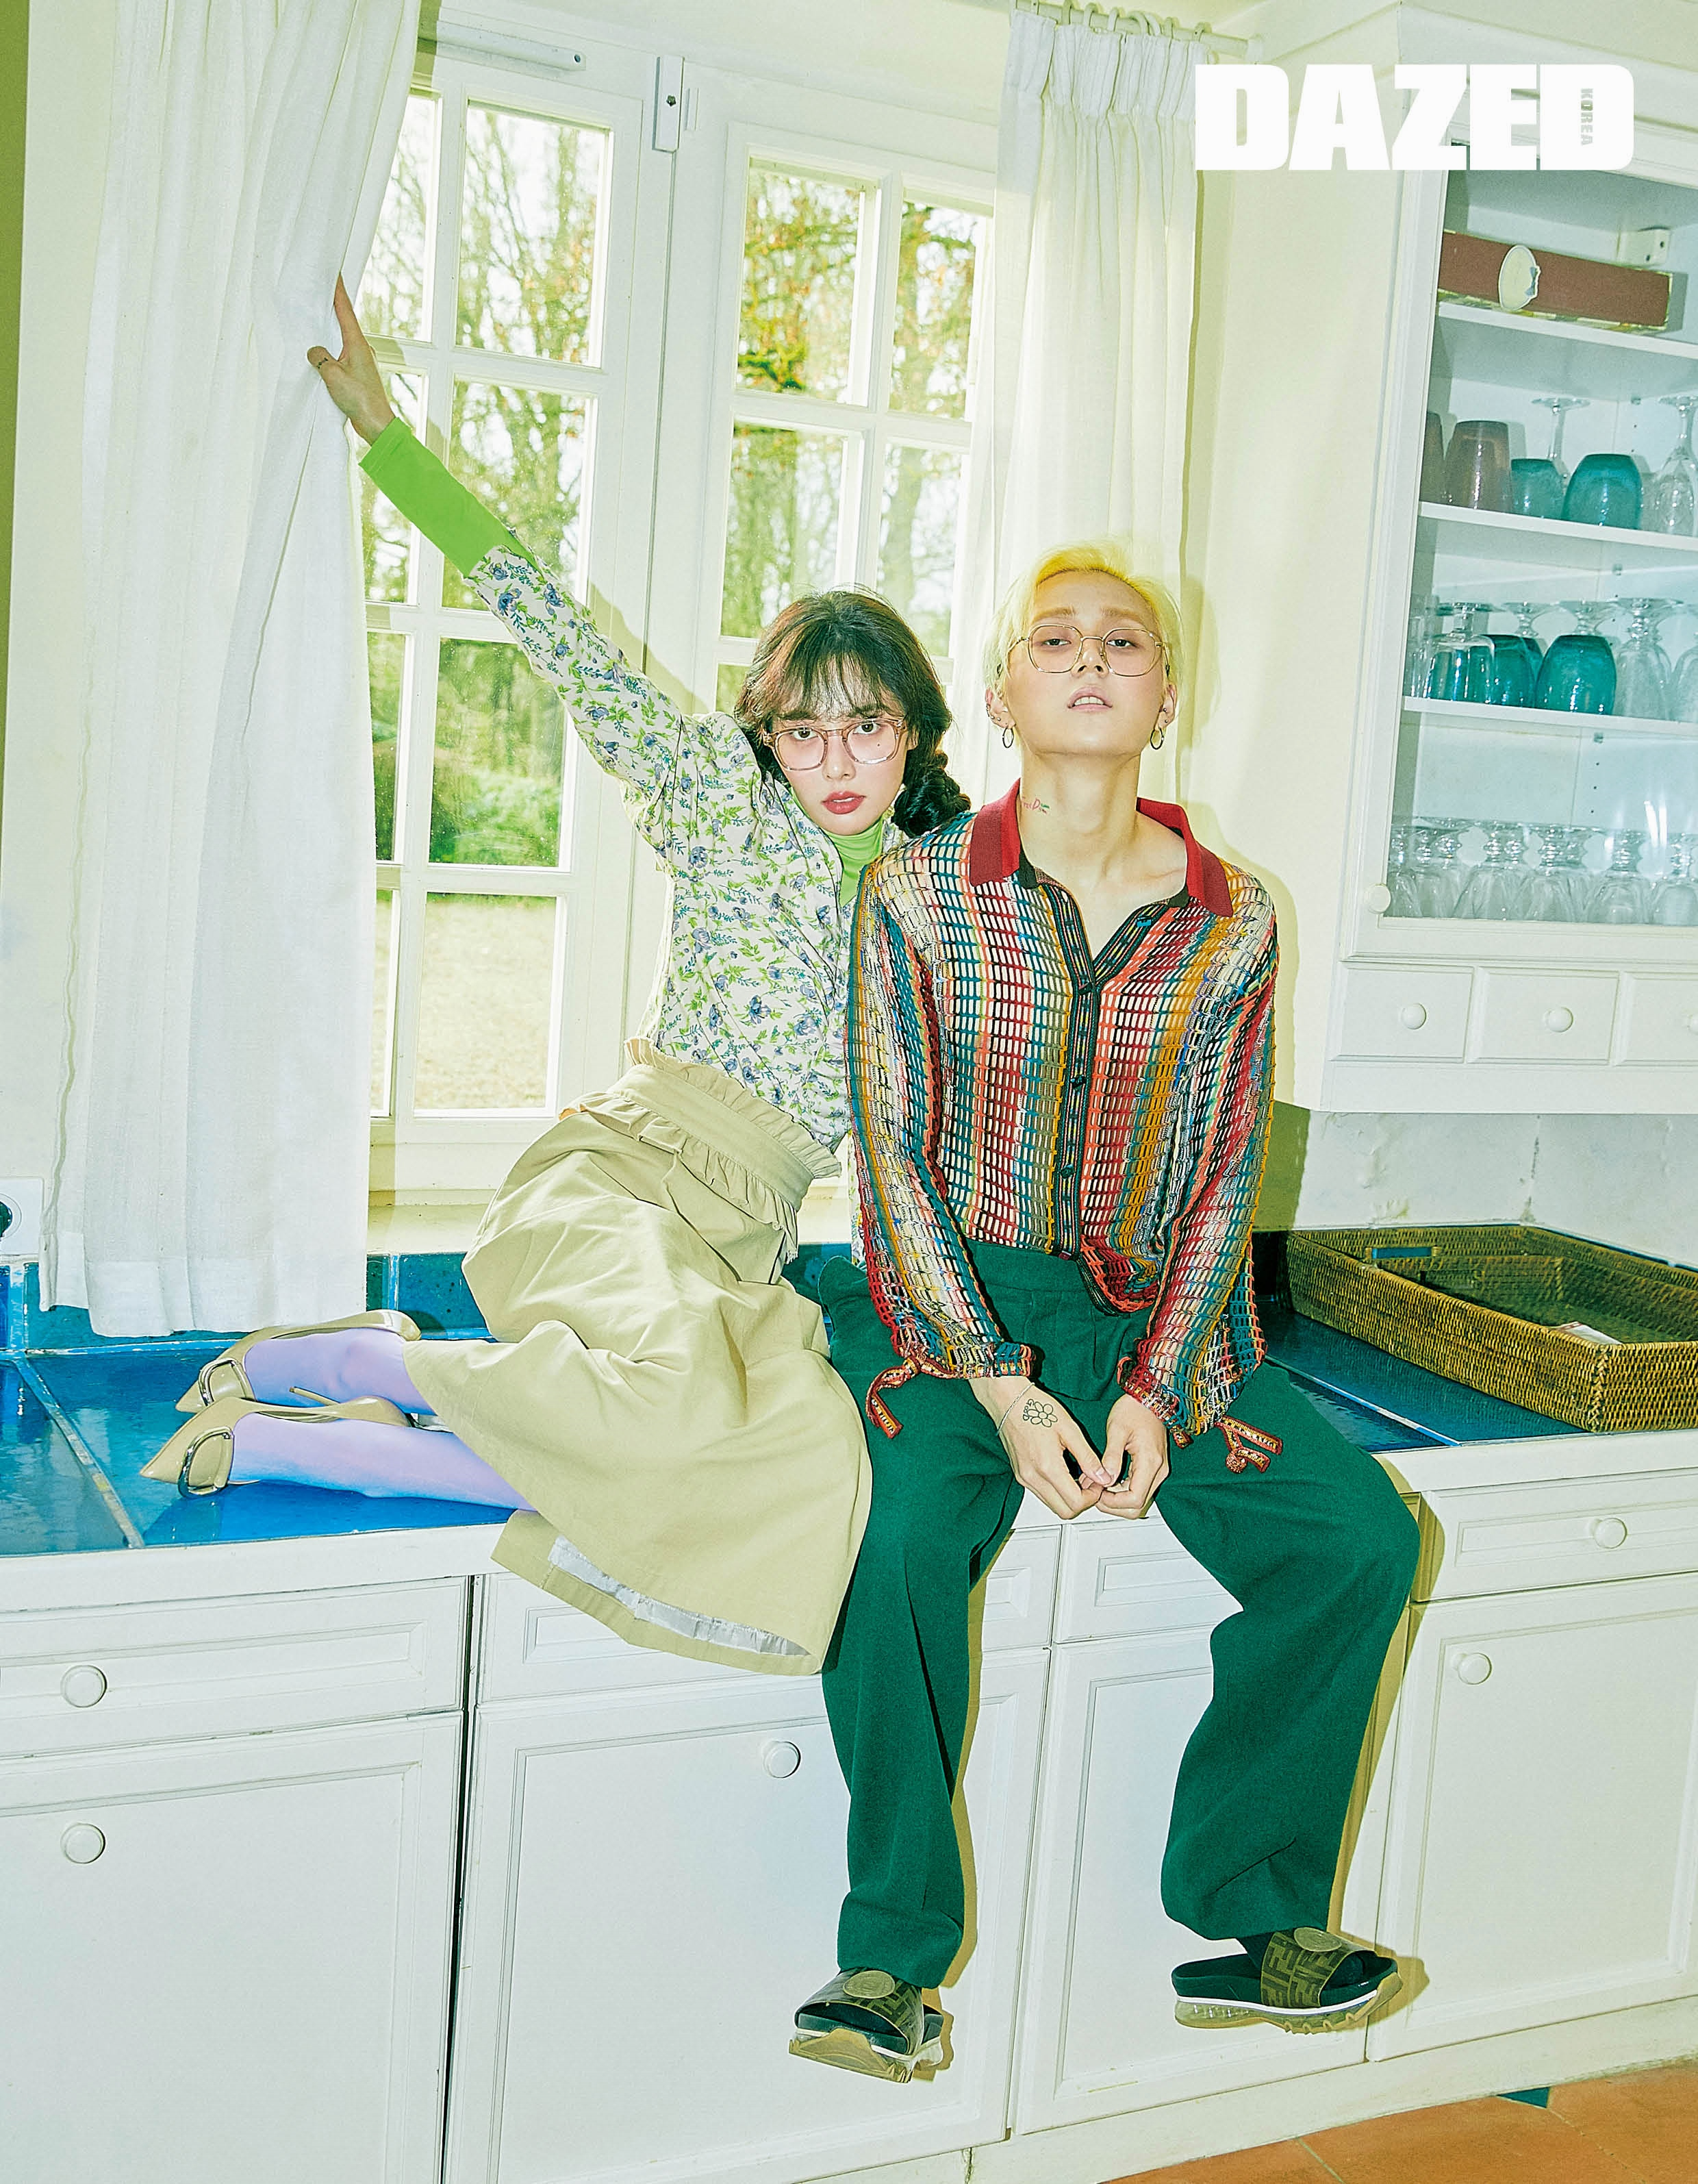 Hyuna, E'Dawn Photoshoot for Dazed Korea 2019 HD - K-Pop ...Hyuna 2019 Pics